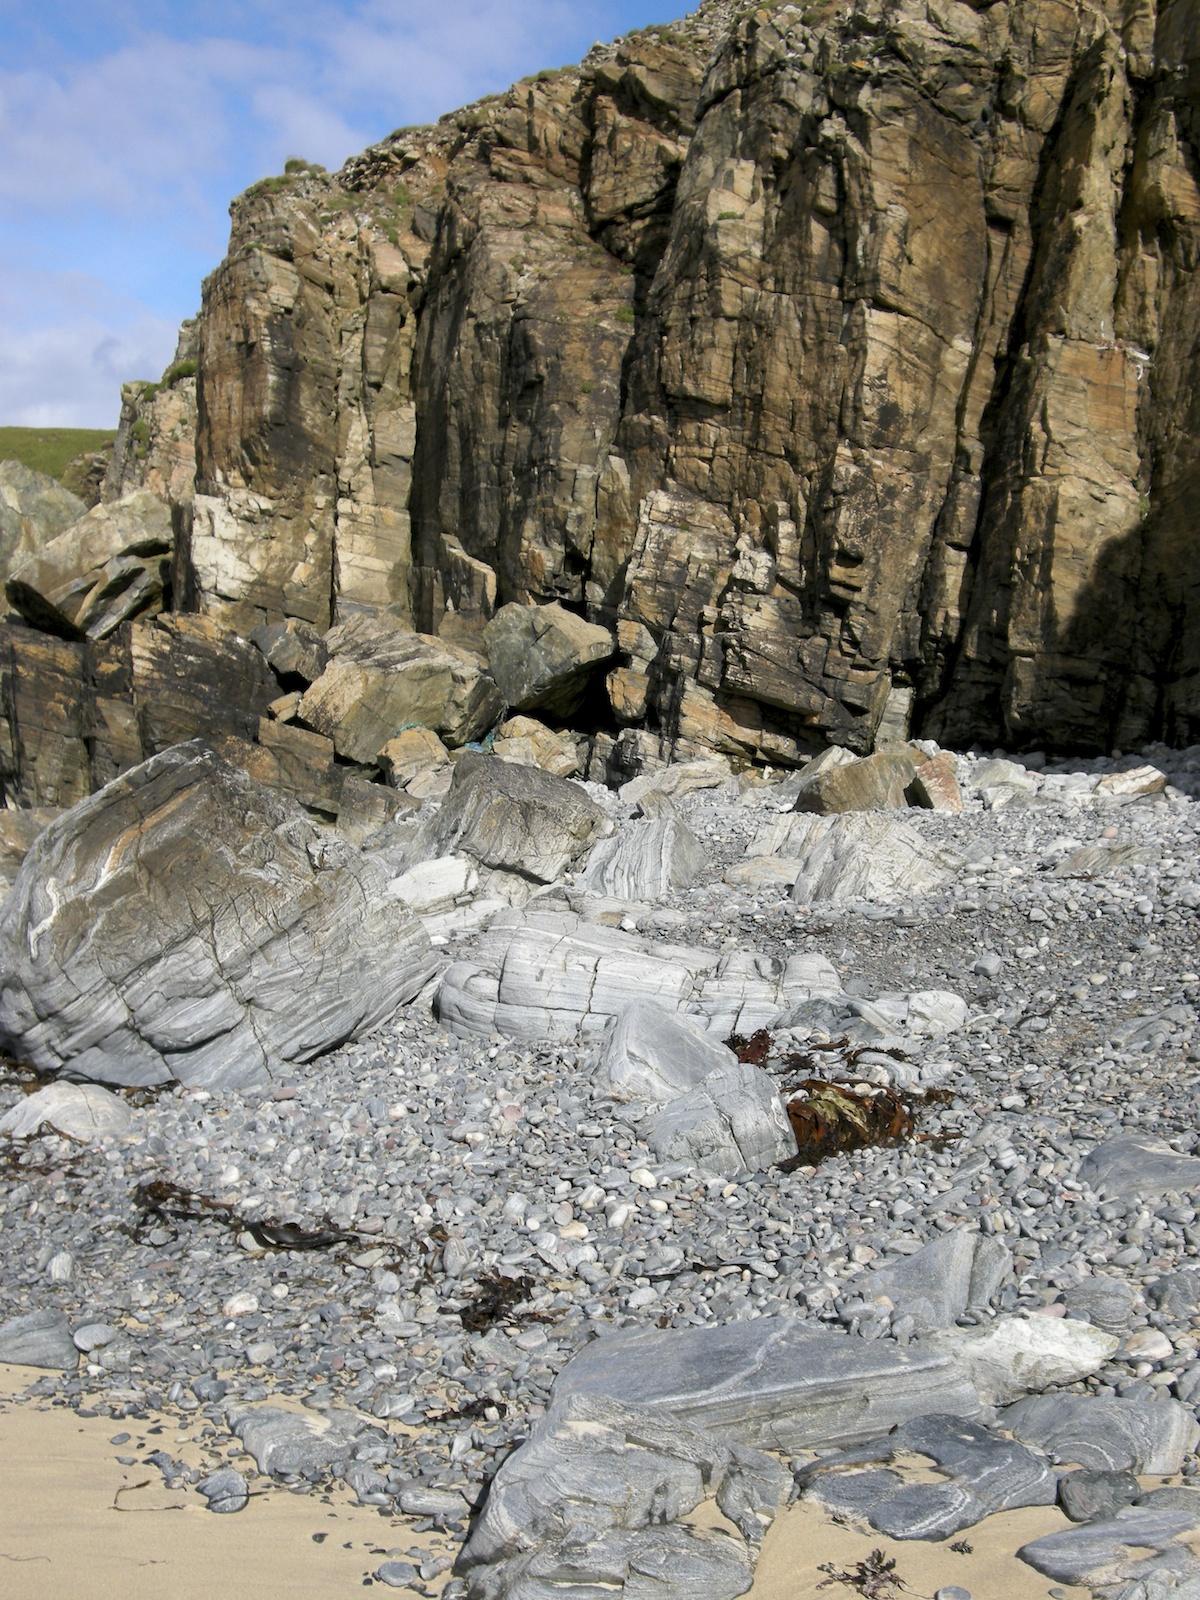 Rocks Lewis 9